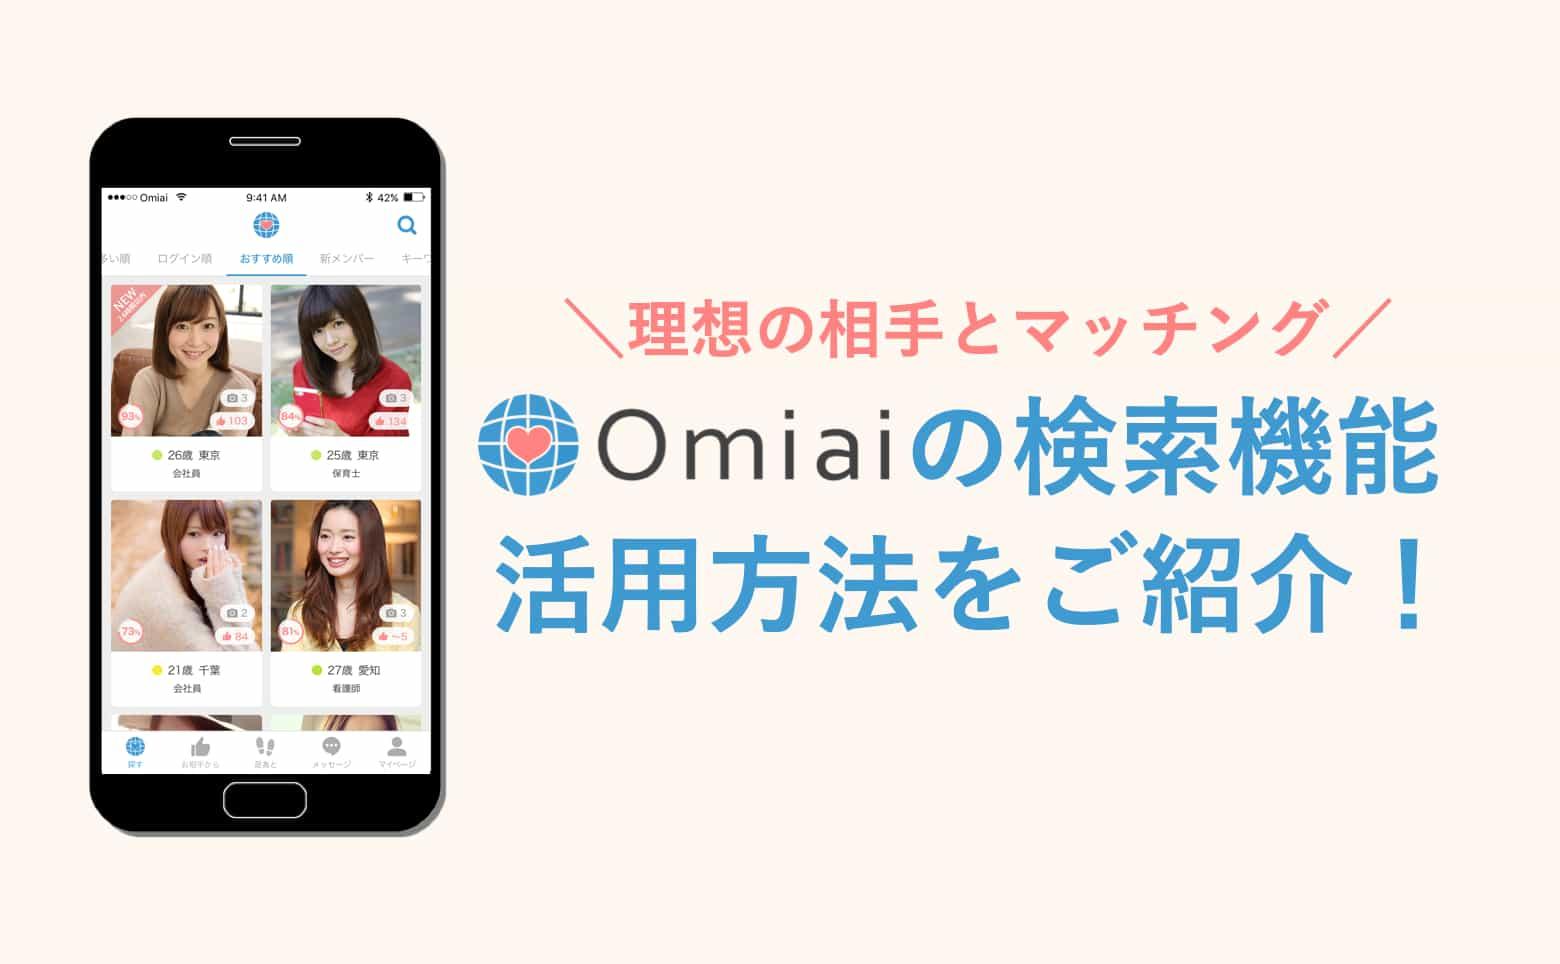 Omiaiの検索機能活用方法【理想の相手とマッチングするために】アイキャッチ